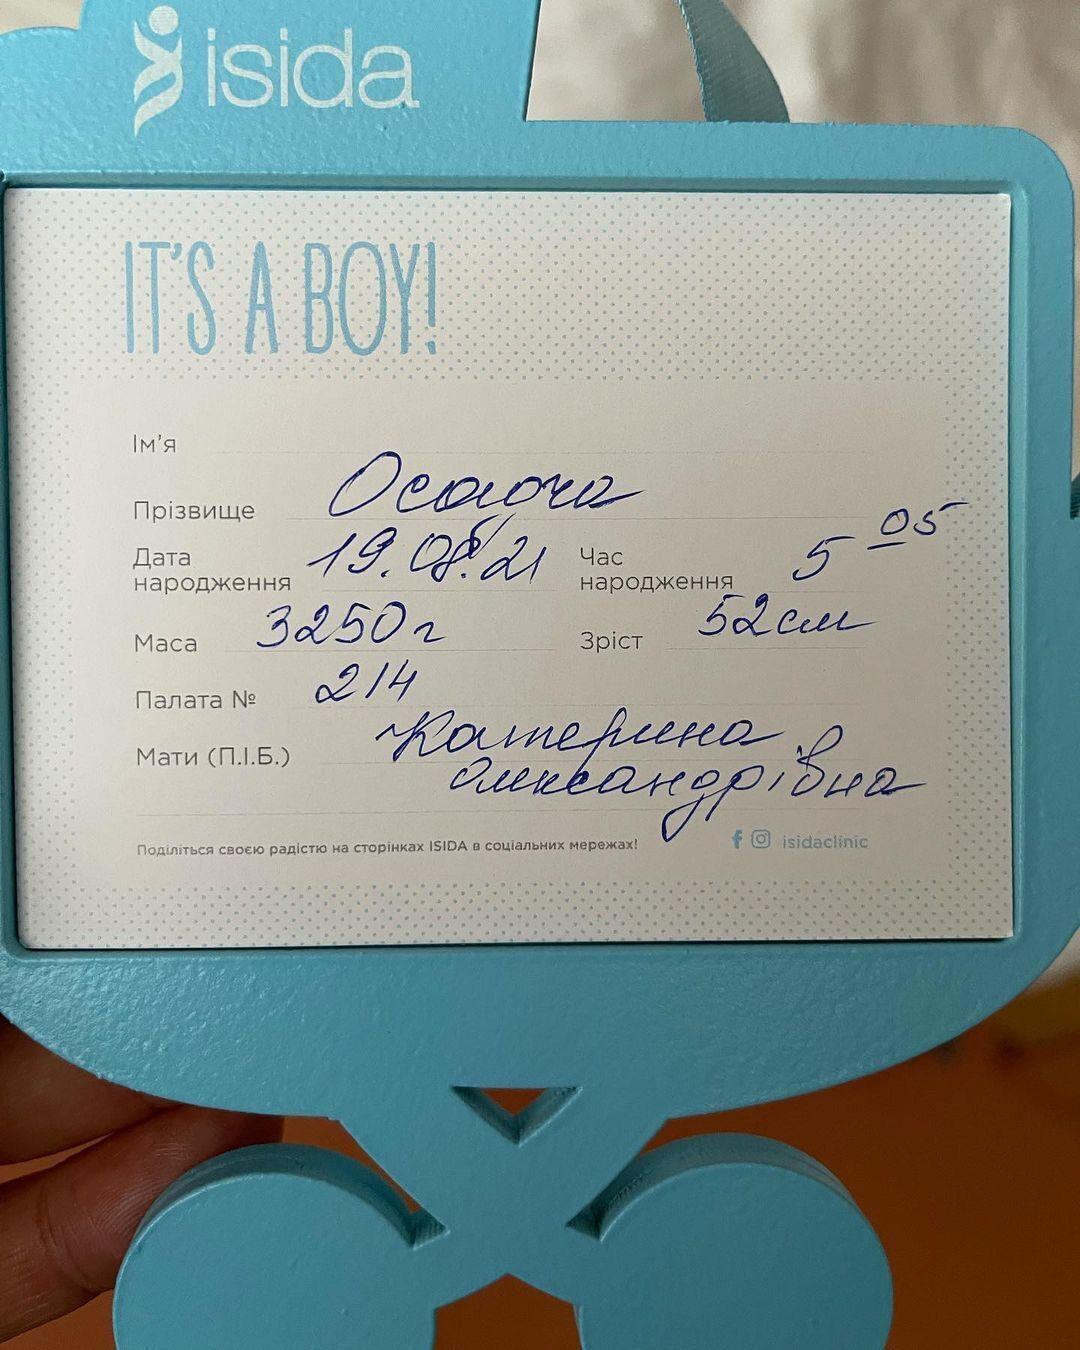 Осадчая родила 19 августа